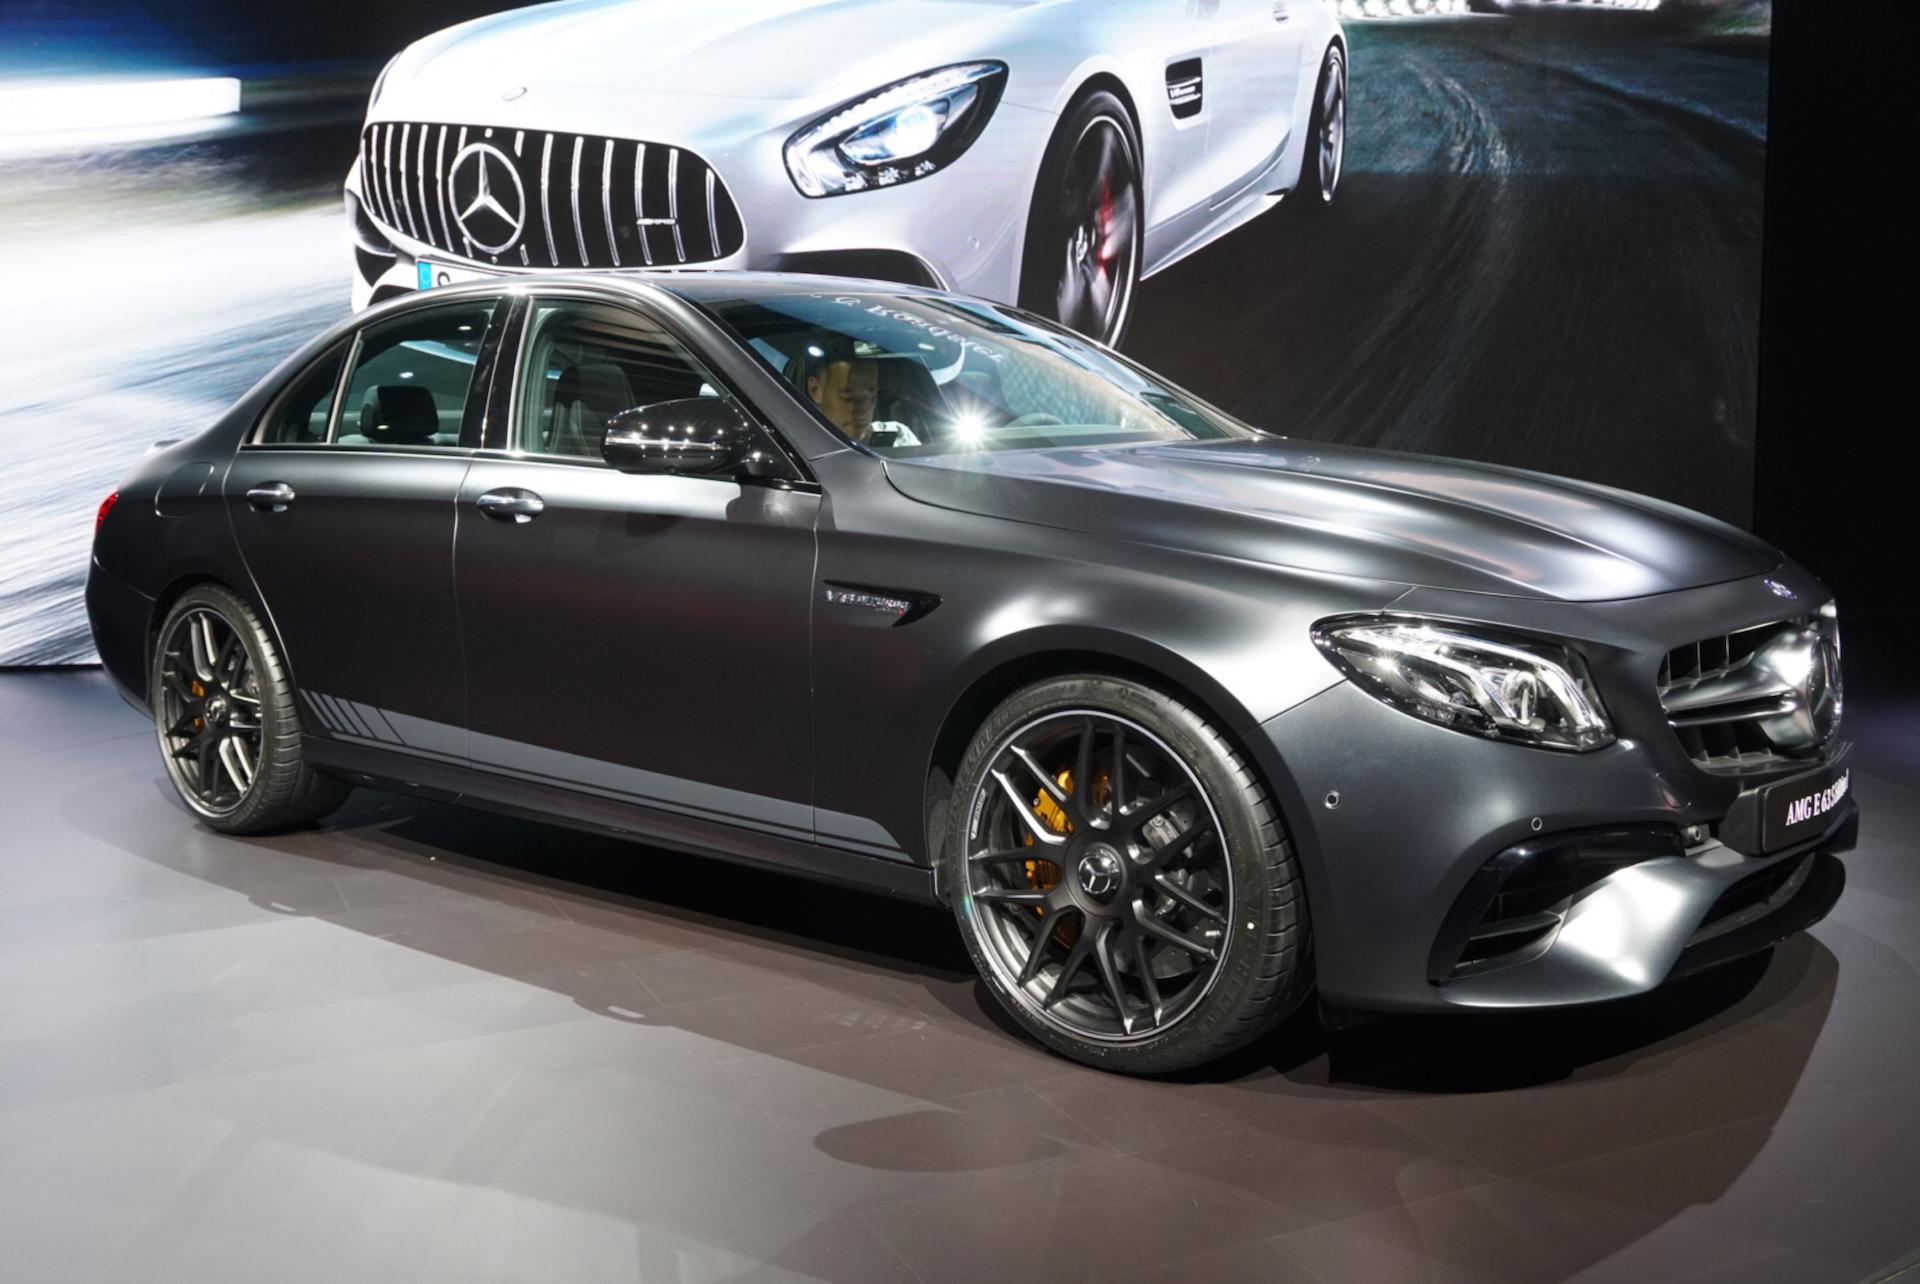 Mercedes amg unveils new e63 at 2016 la auto show for Mercedes benz louisiana